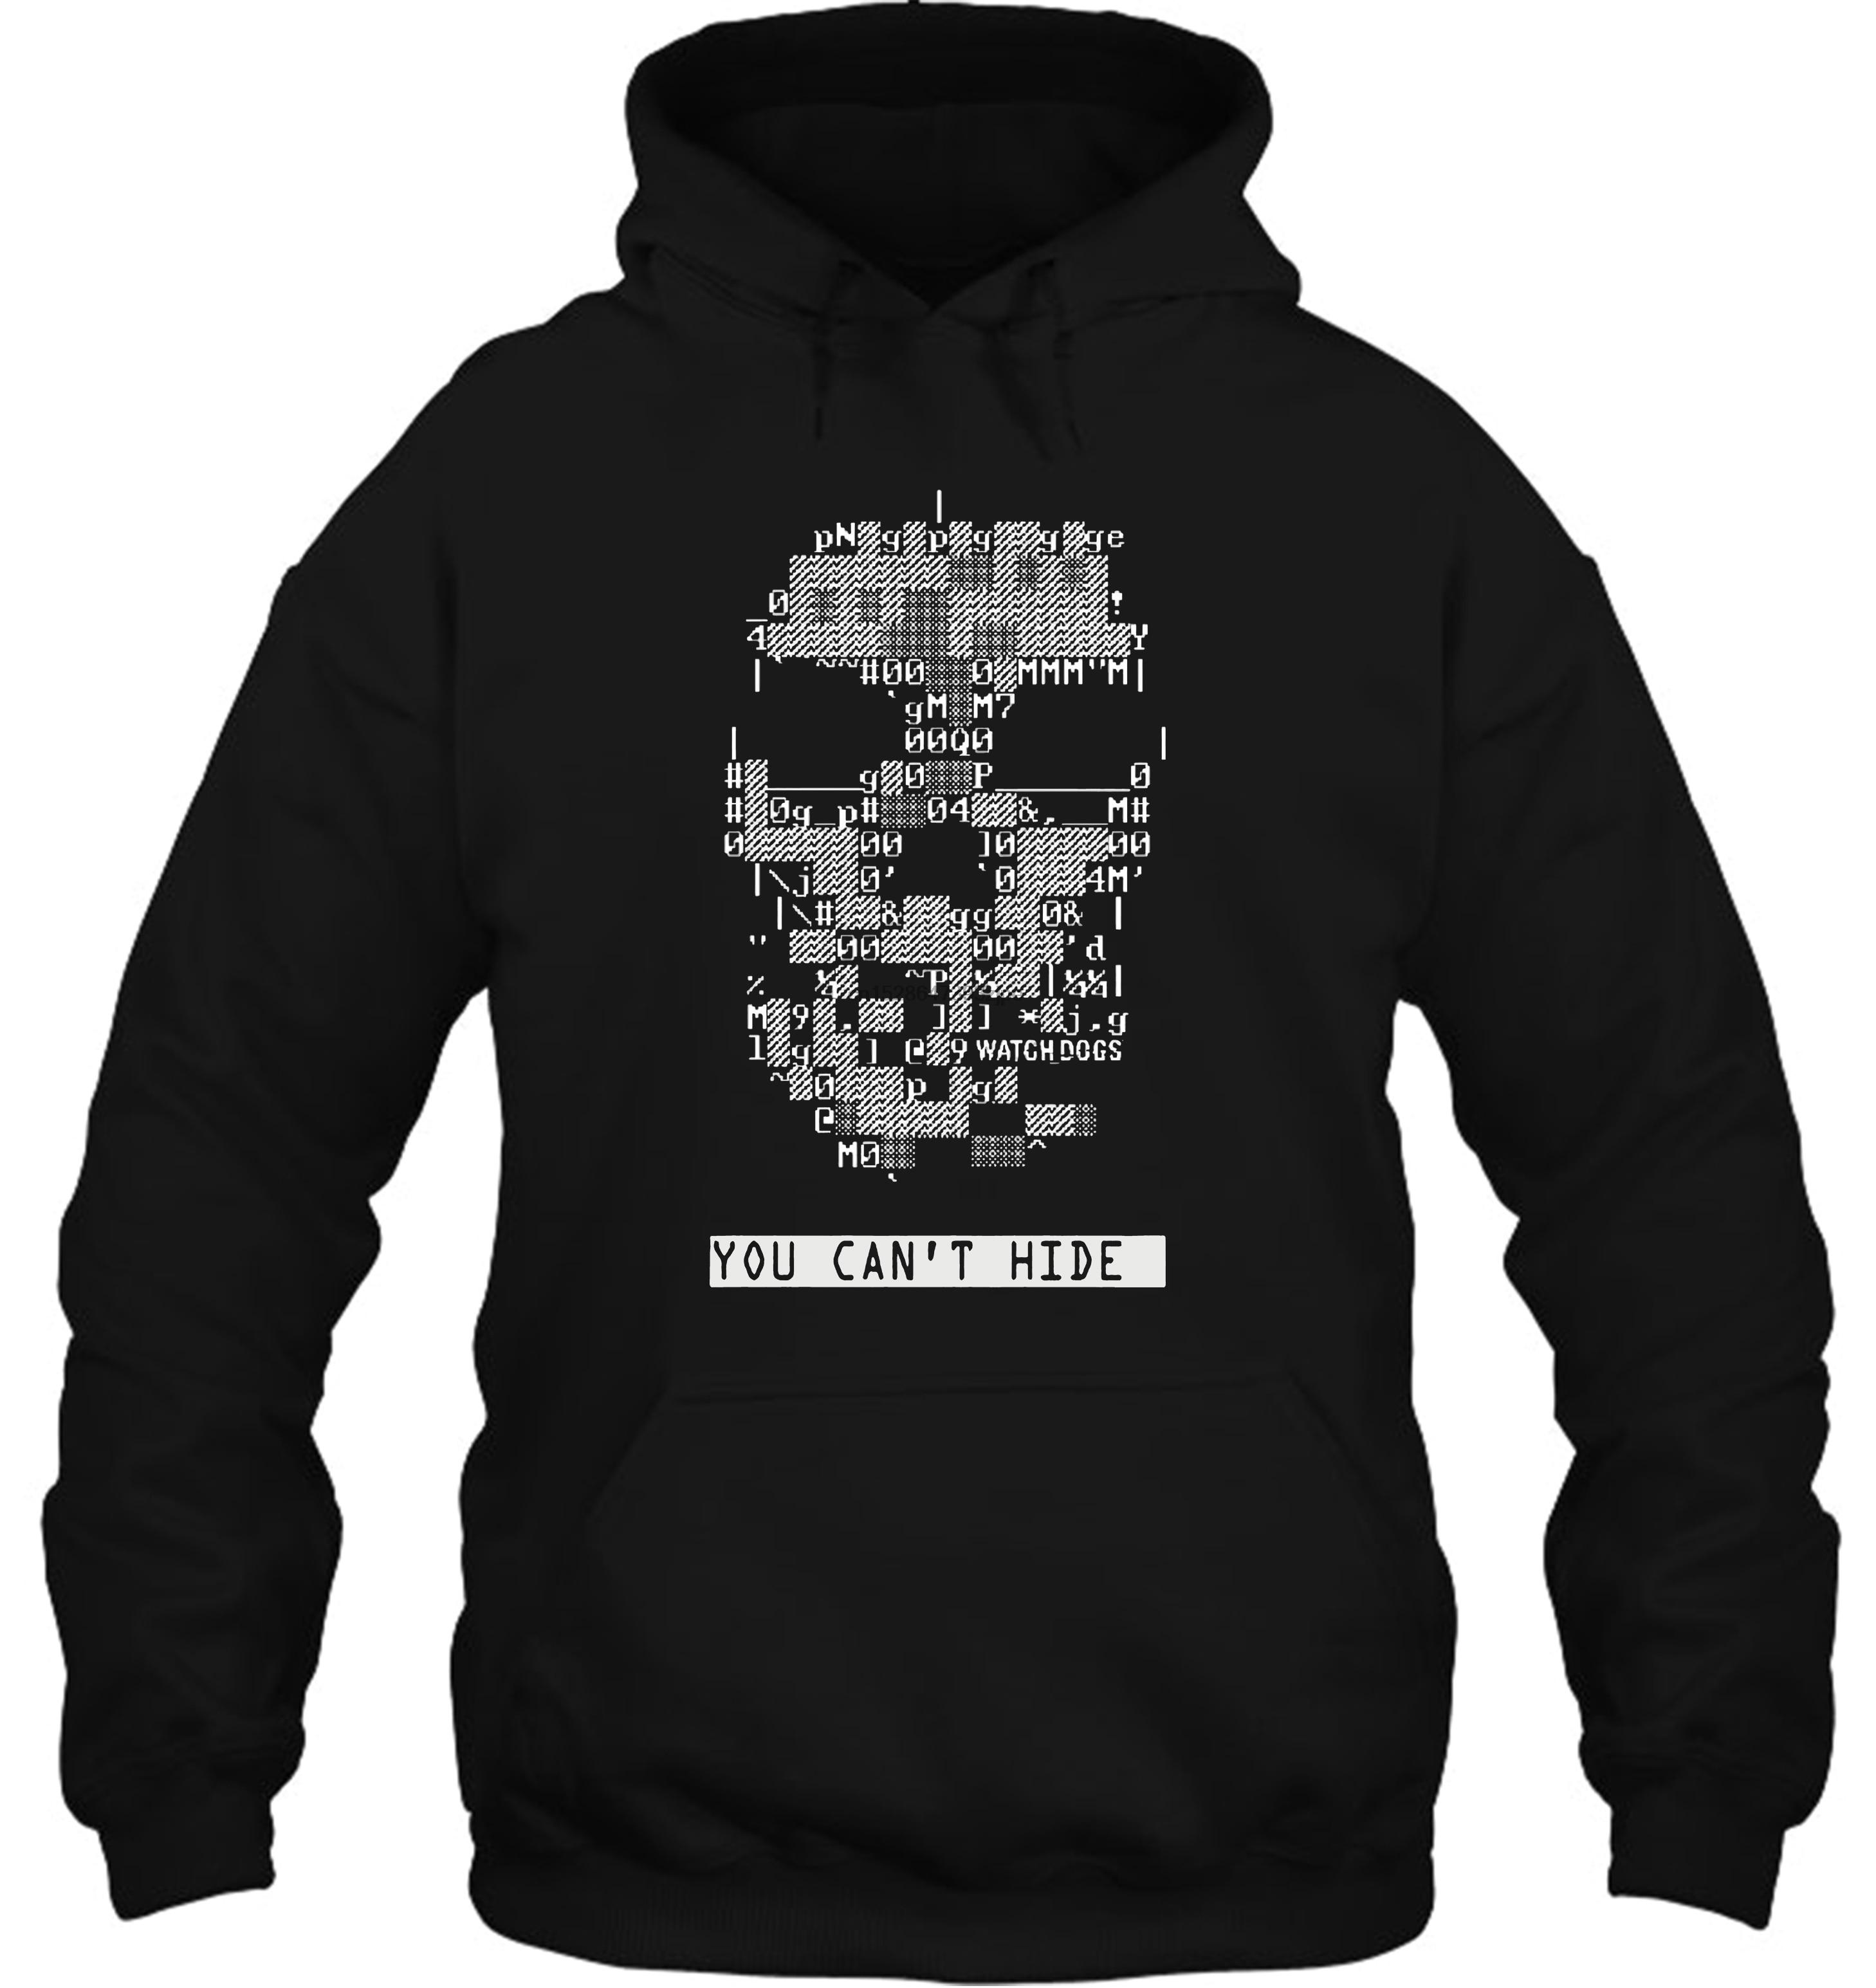 Funny White Black Tee Hot WATCH DOGS Dedsec Skull Extra Extra Men's Black Streetwear Men Women Hoodies Sweatshirts